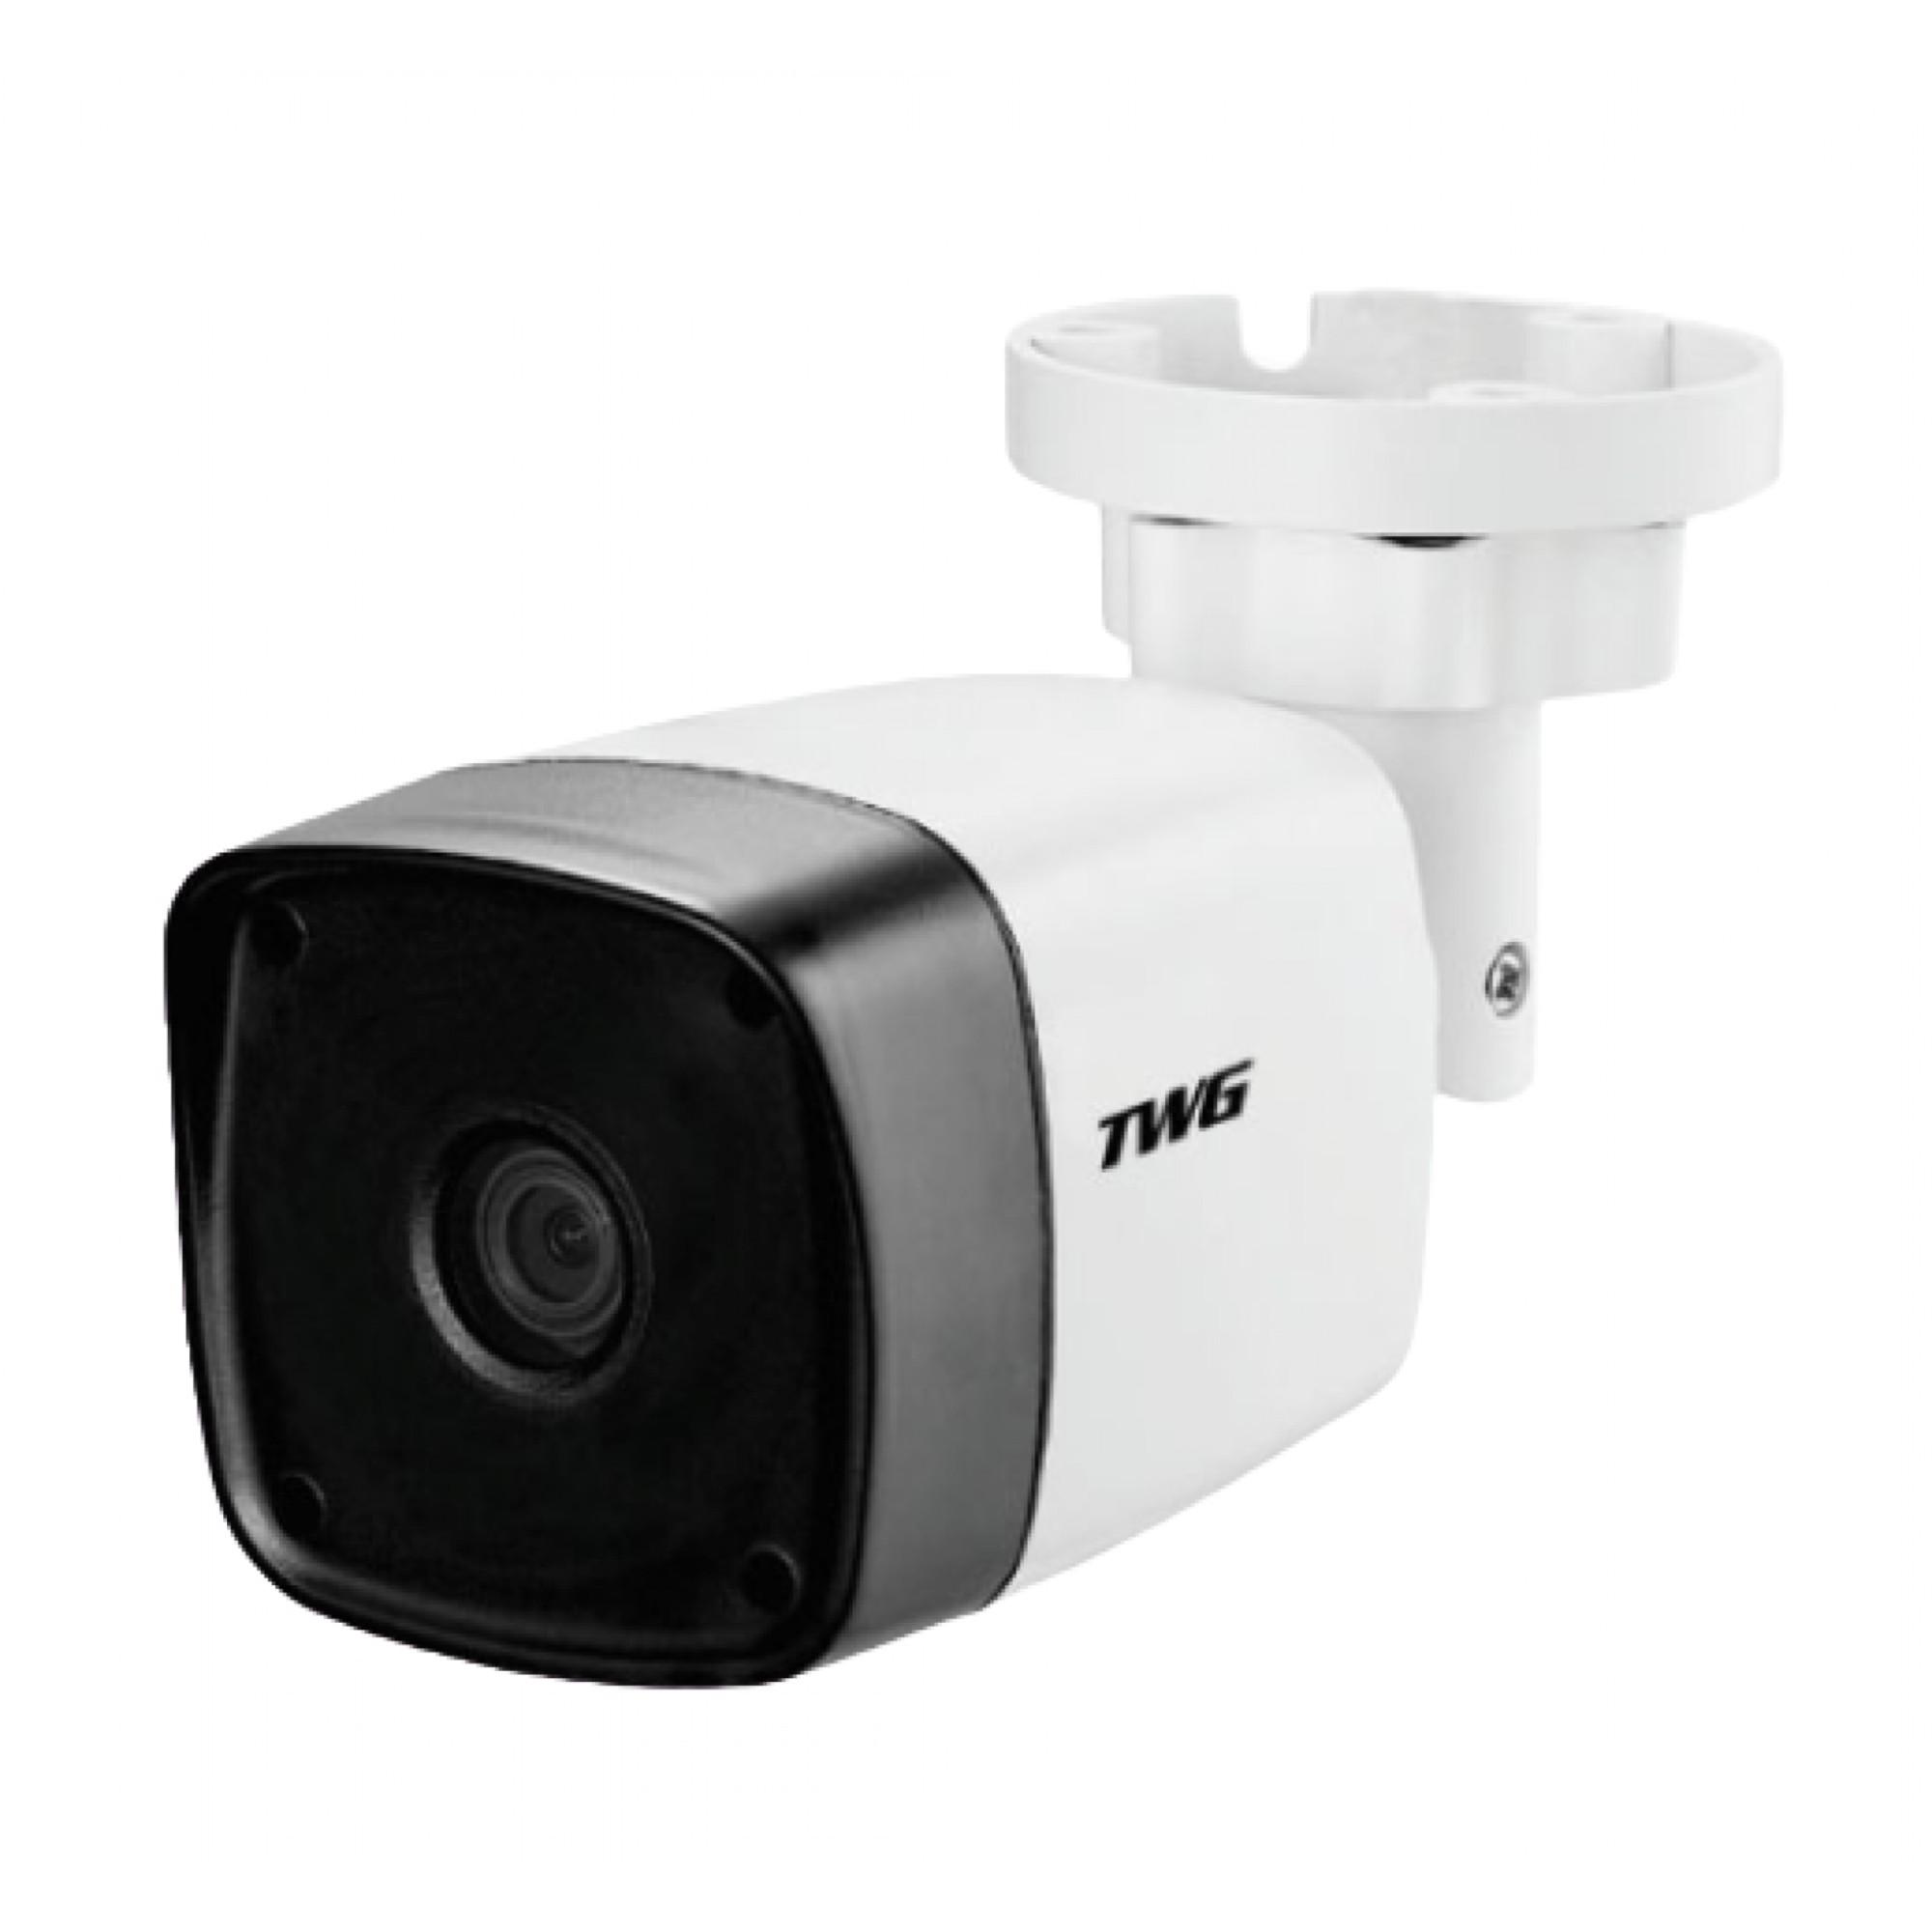 Câmera Full Hd 2mp 3,6mm Star Vision TWG IR Colorido Noturno